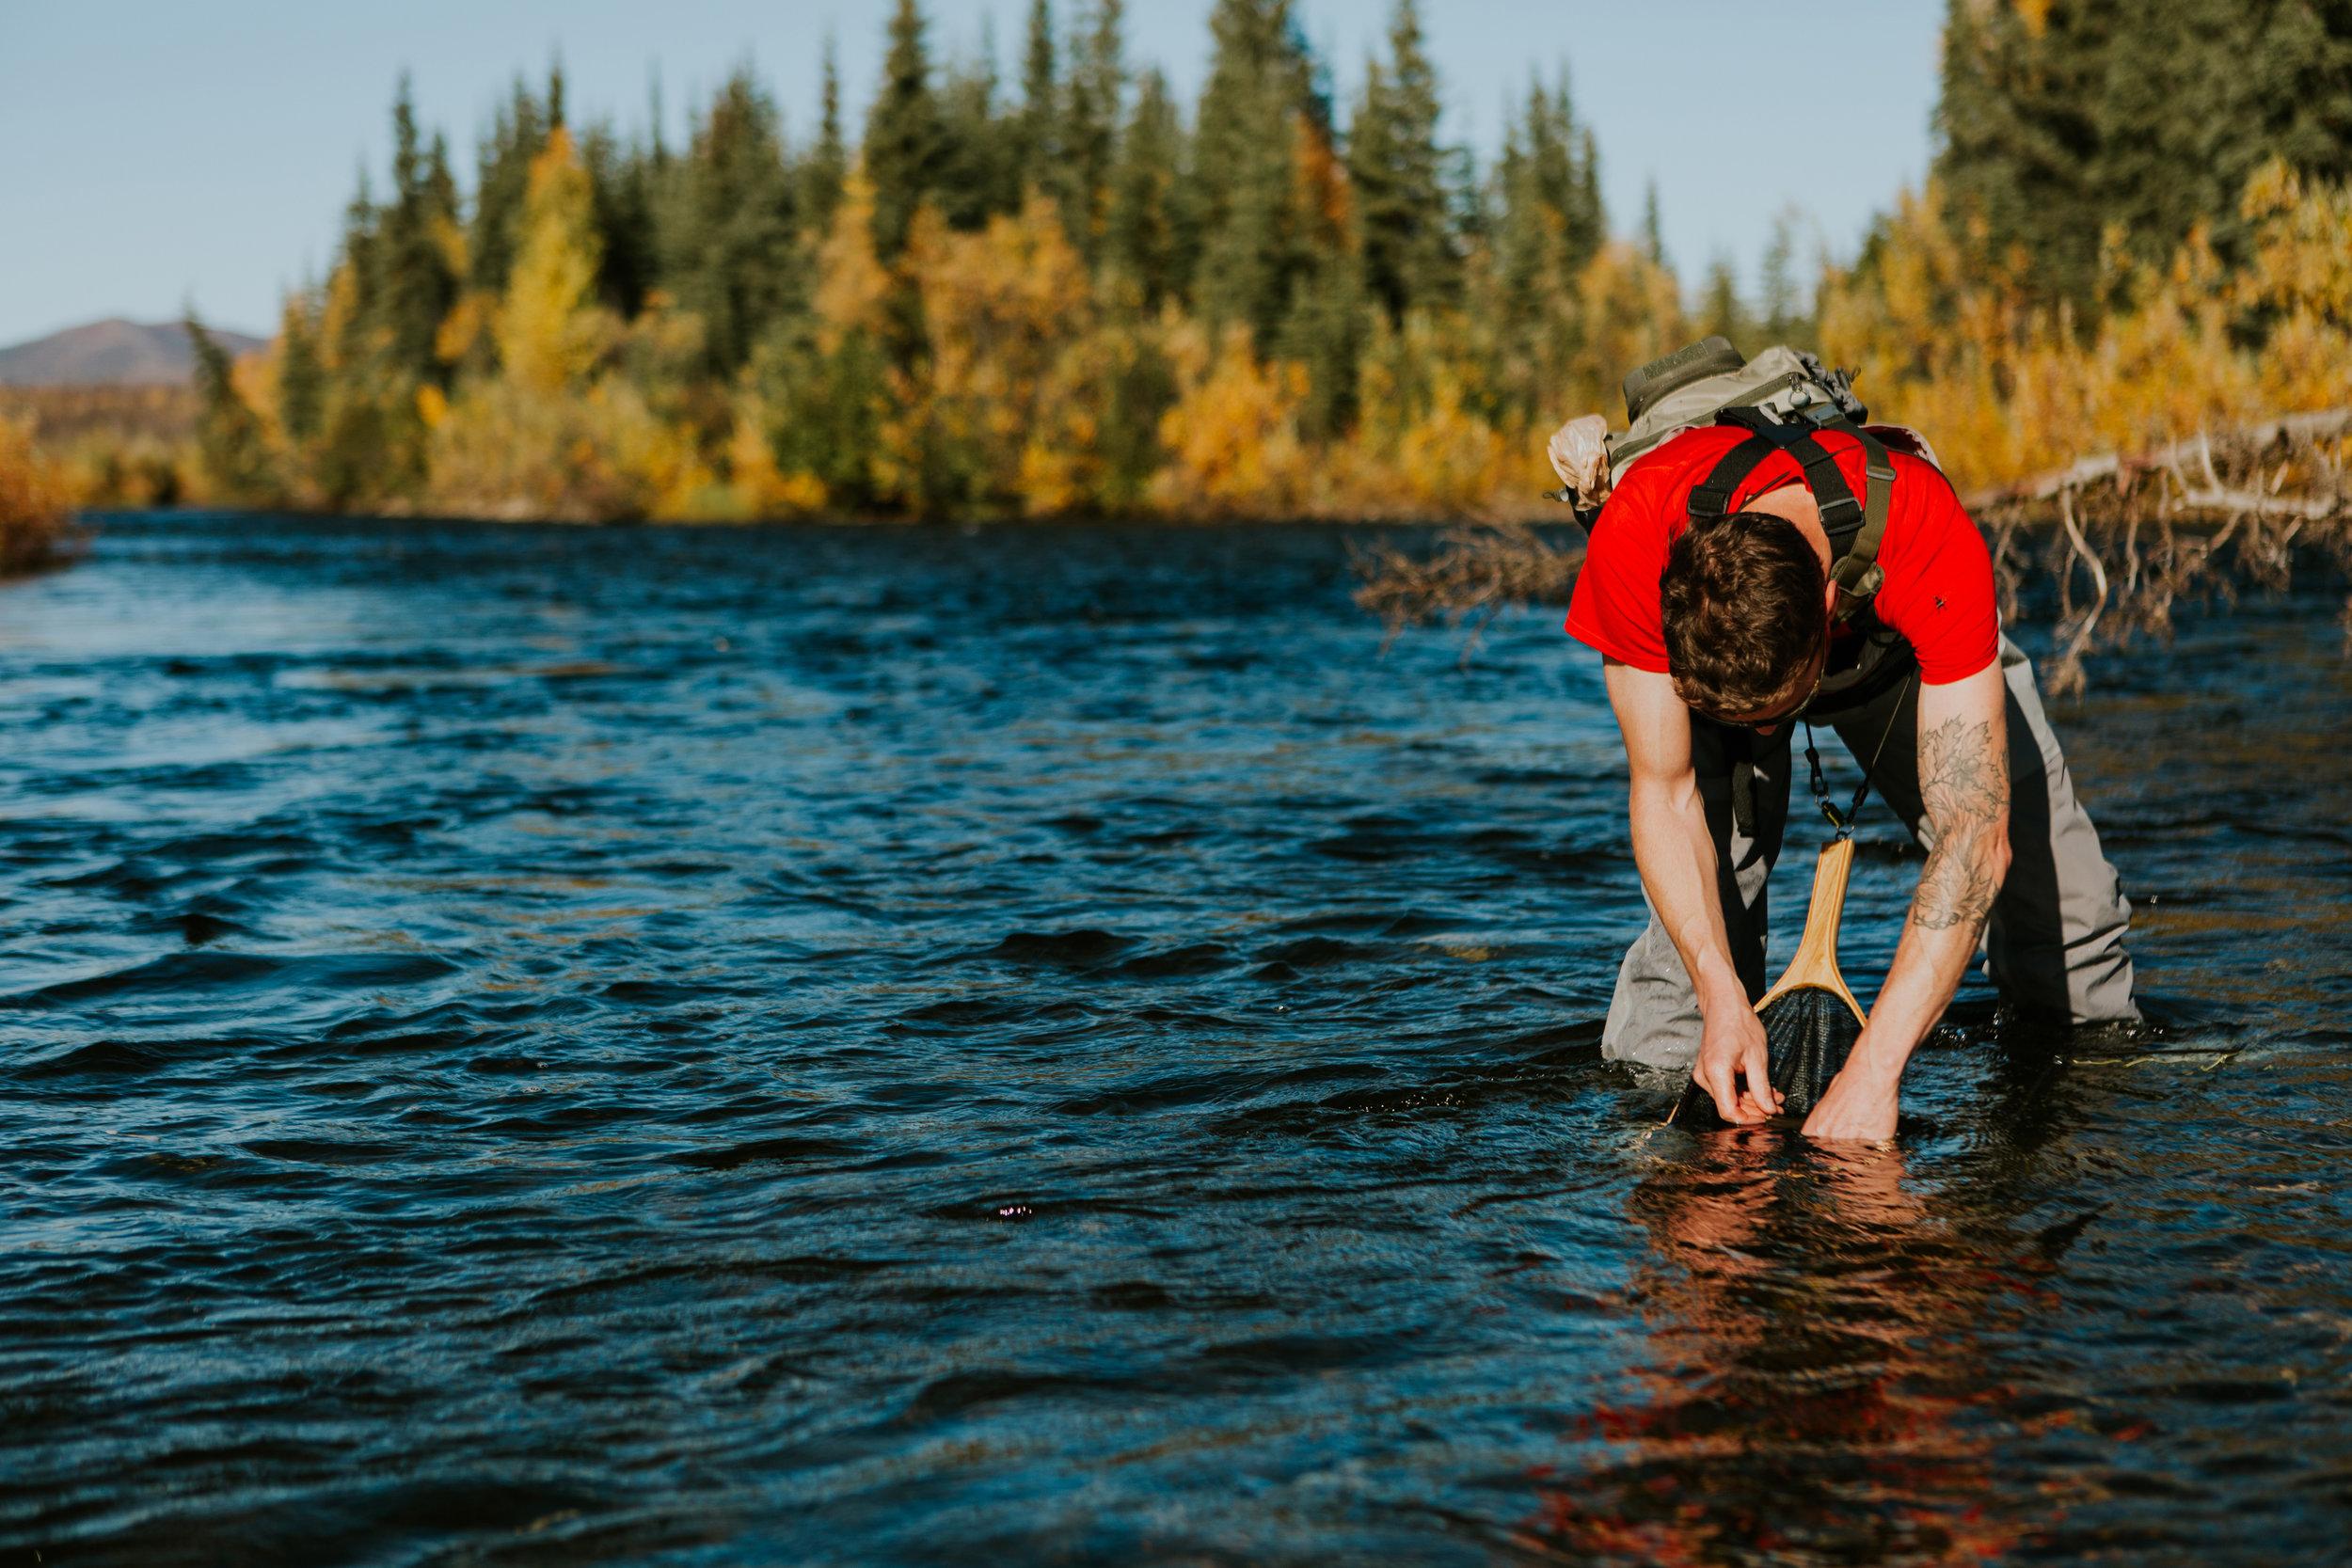 CindyGiovagnoli_Alaska_KoyukukRiver_SukakpakMountain_JimRiver_ArcticCircle_fly_fishing_September-067.jpg